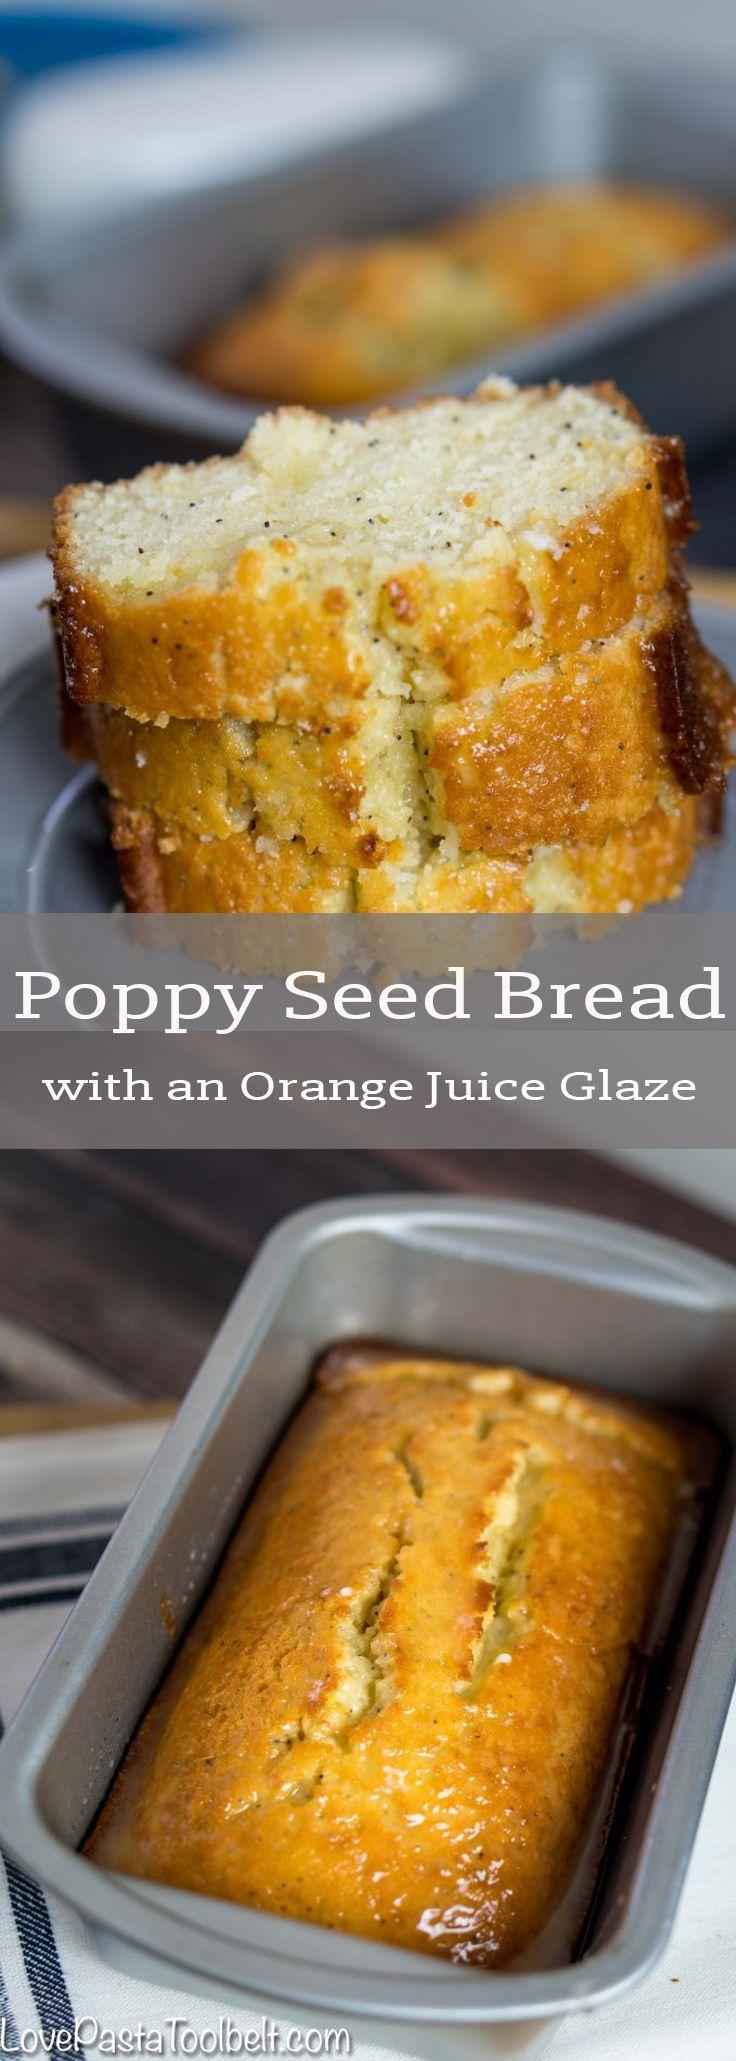 Poppy Seed Bread with an Orange Juice Glaze | Breakfast | bread | brunch | snack | glaze | orange juice | afternoon snack |    via @LovePastaBlog